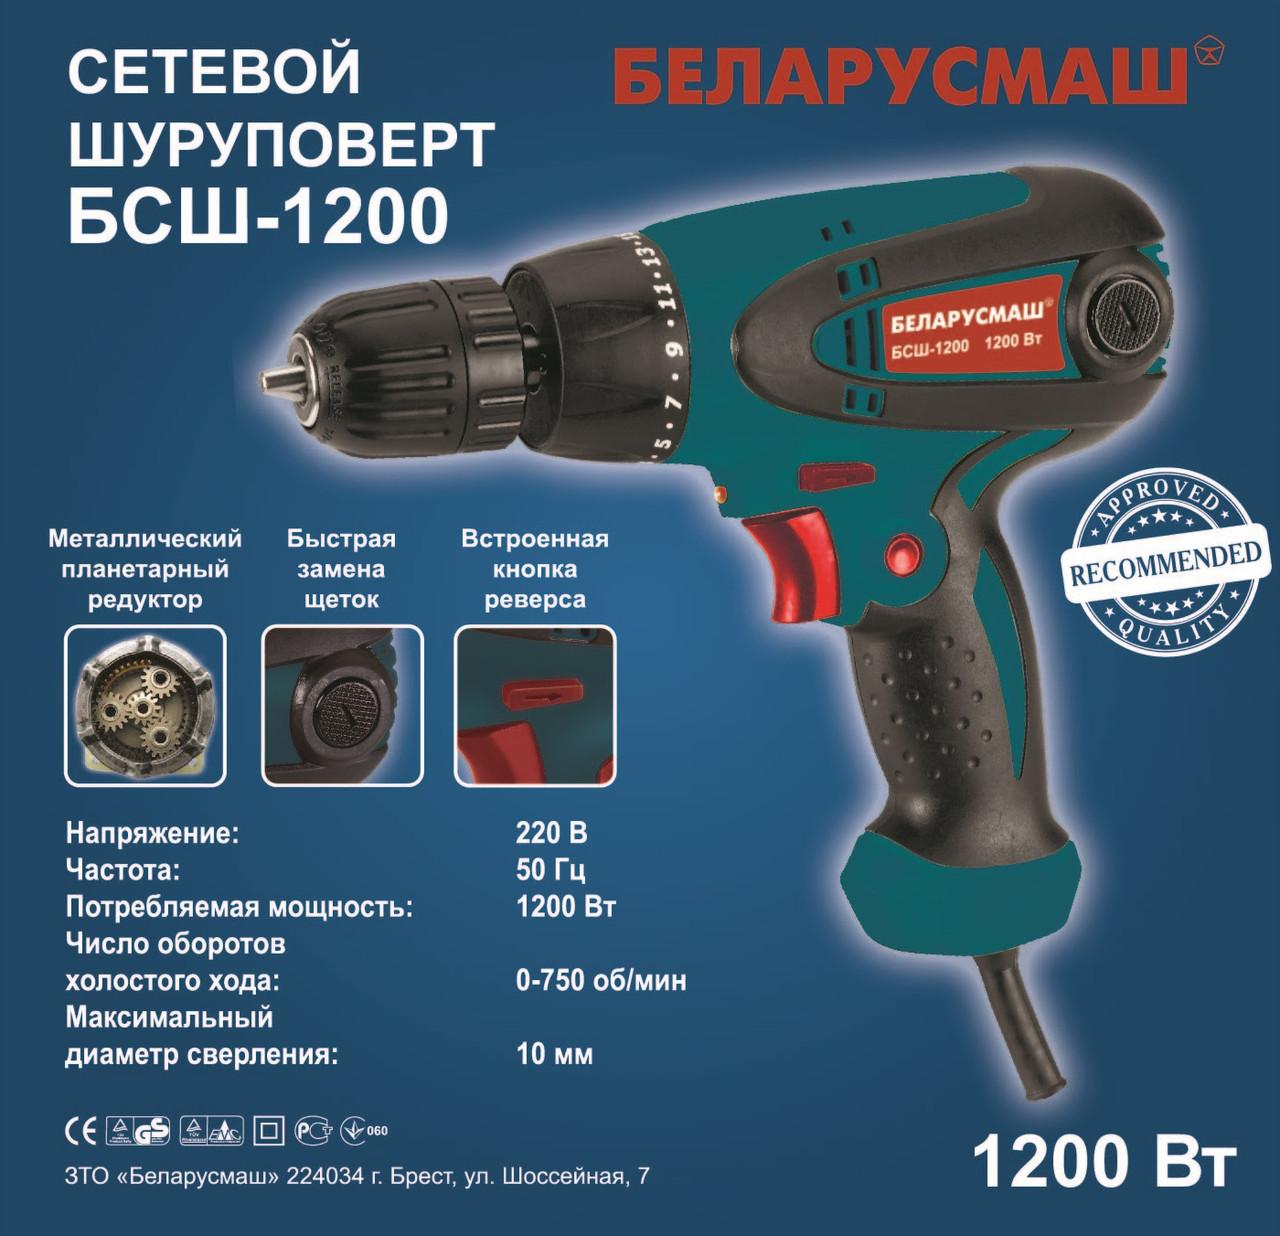 Шуруповерт мережевий Беларусмаш БСШ-1200